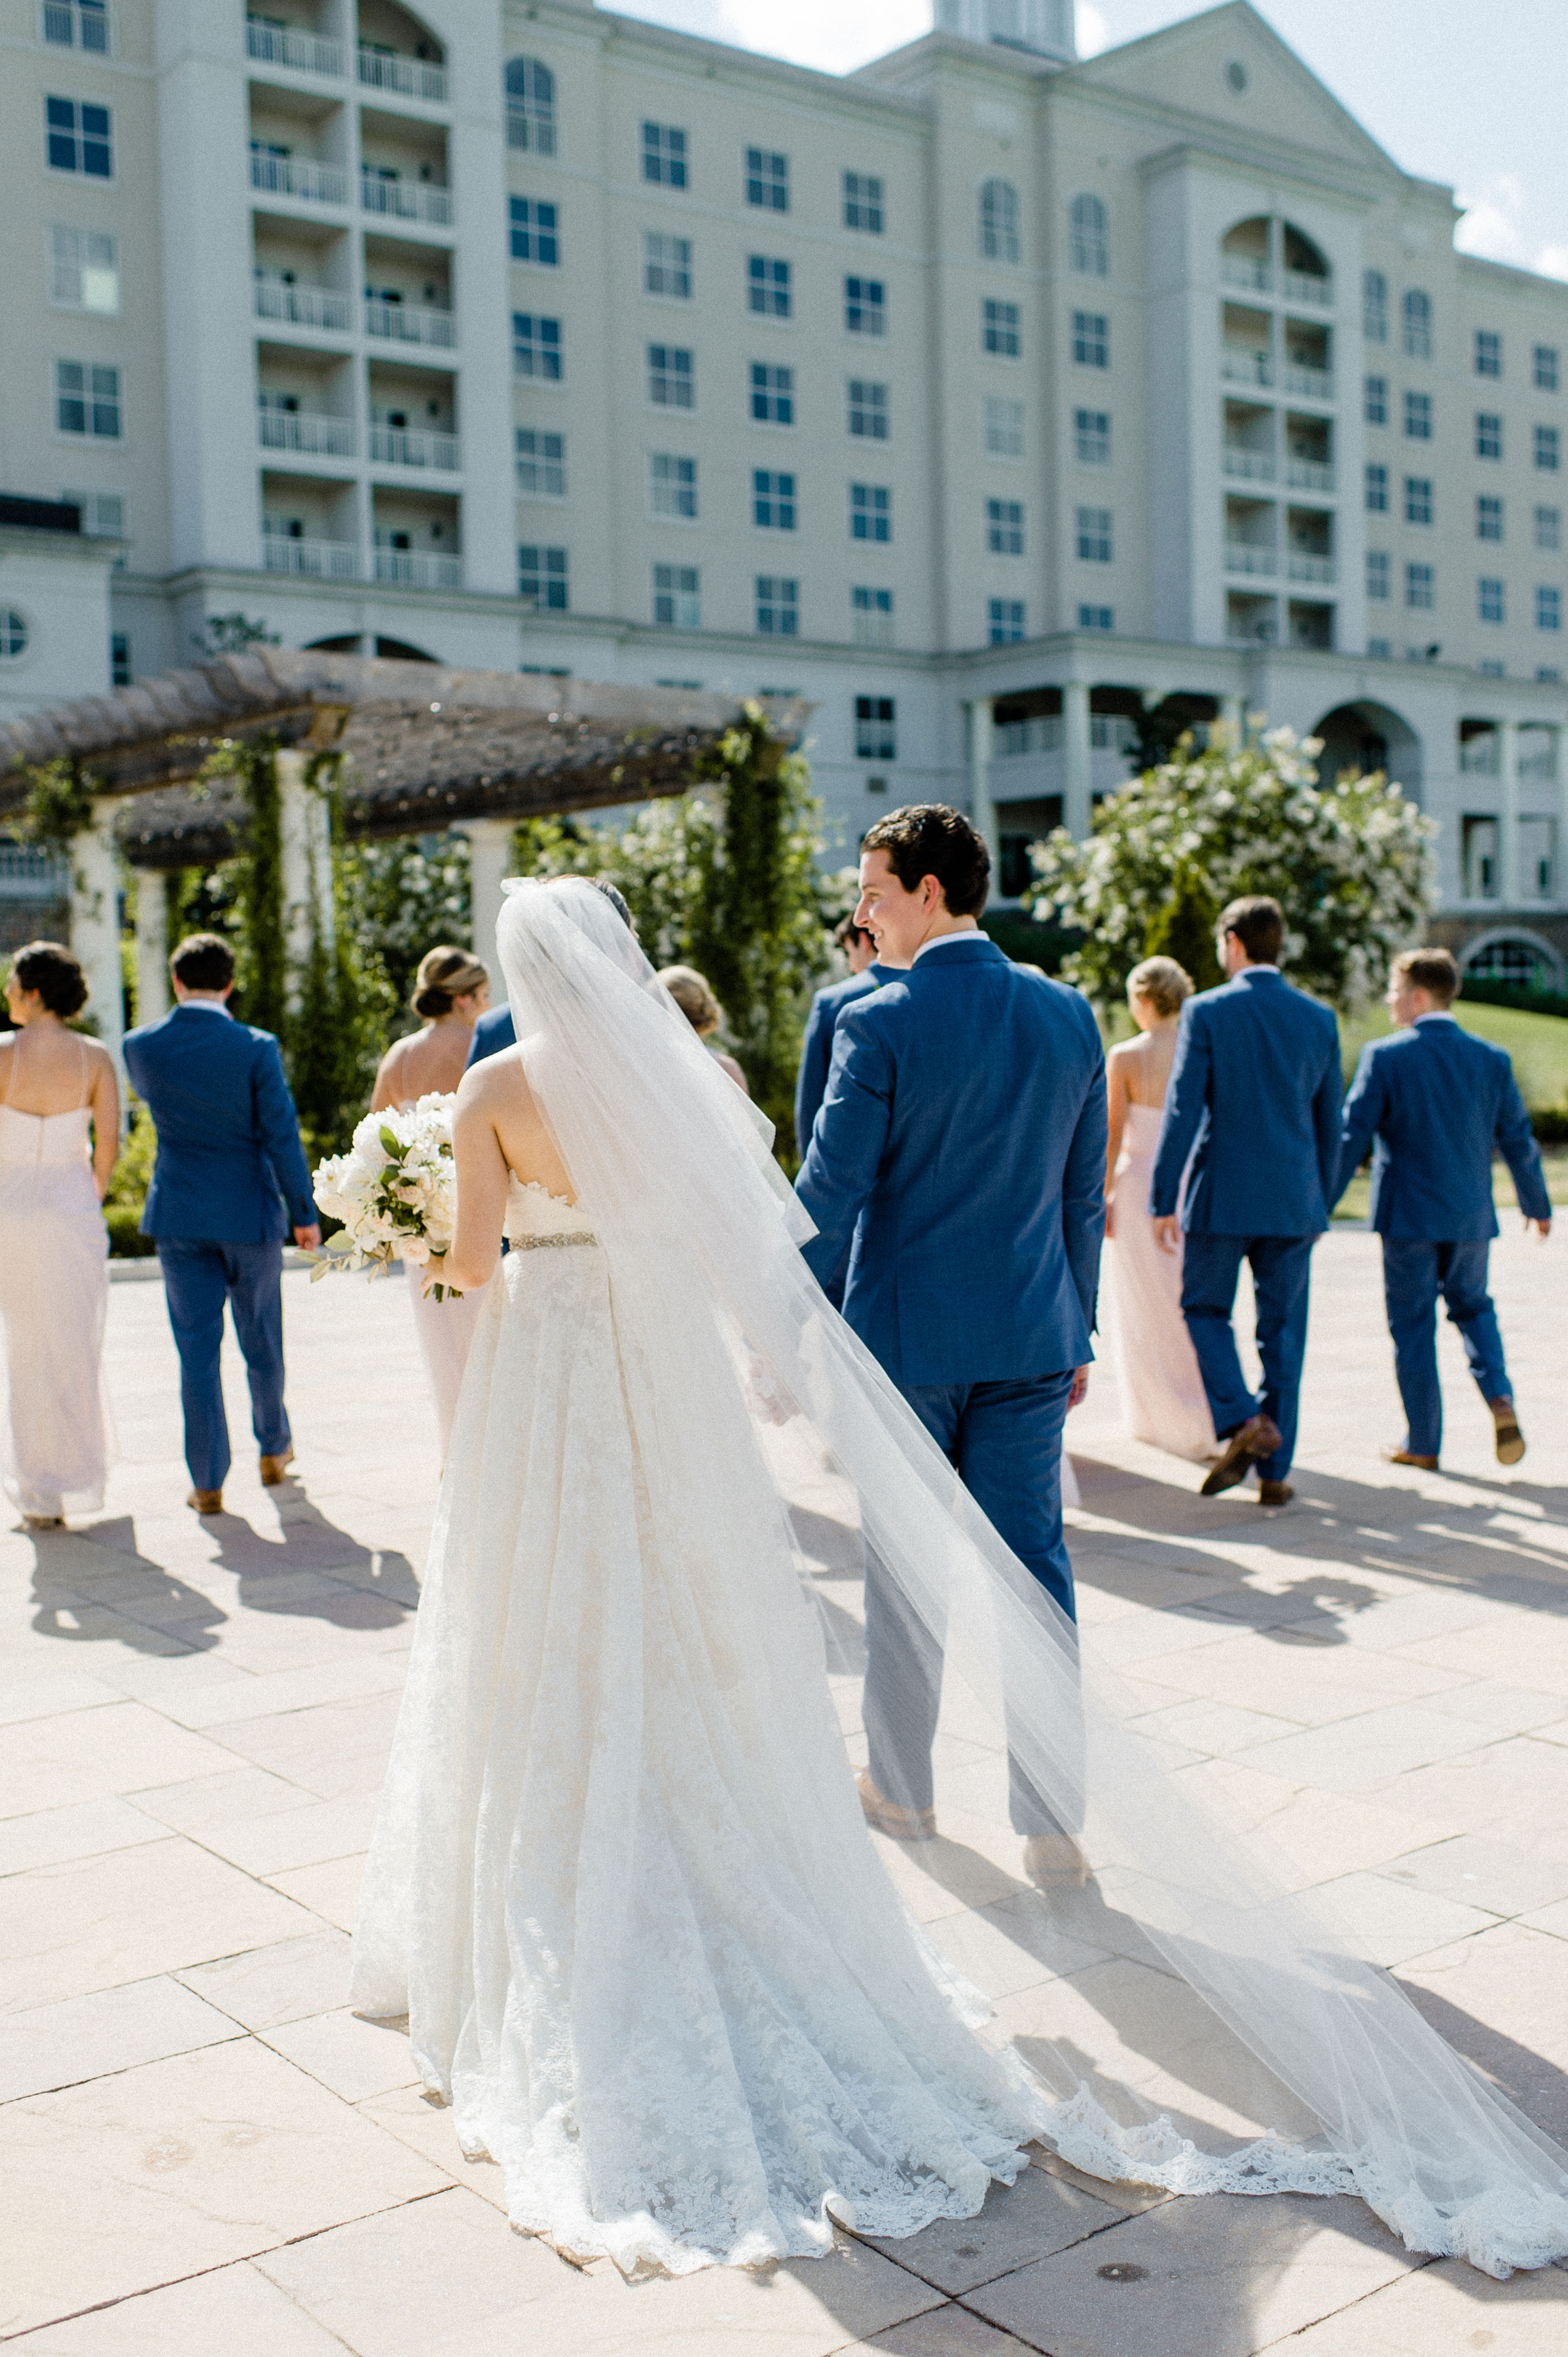 McElravey_Wedding_CarolineLimaPhotography_2018_187.jpg